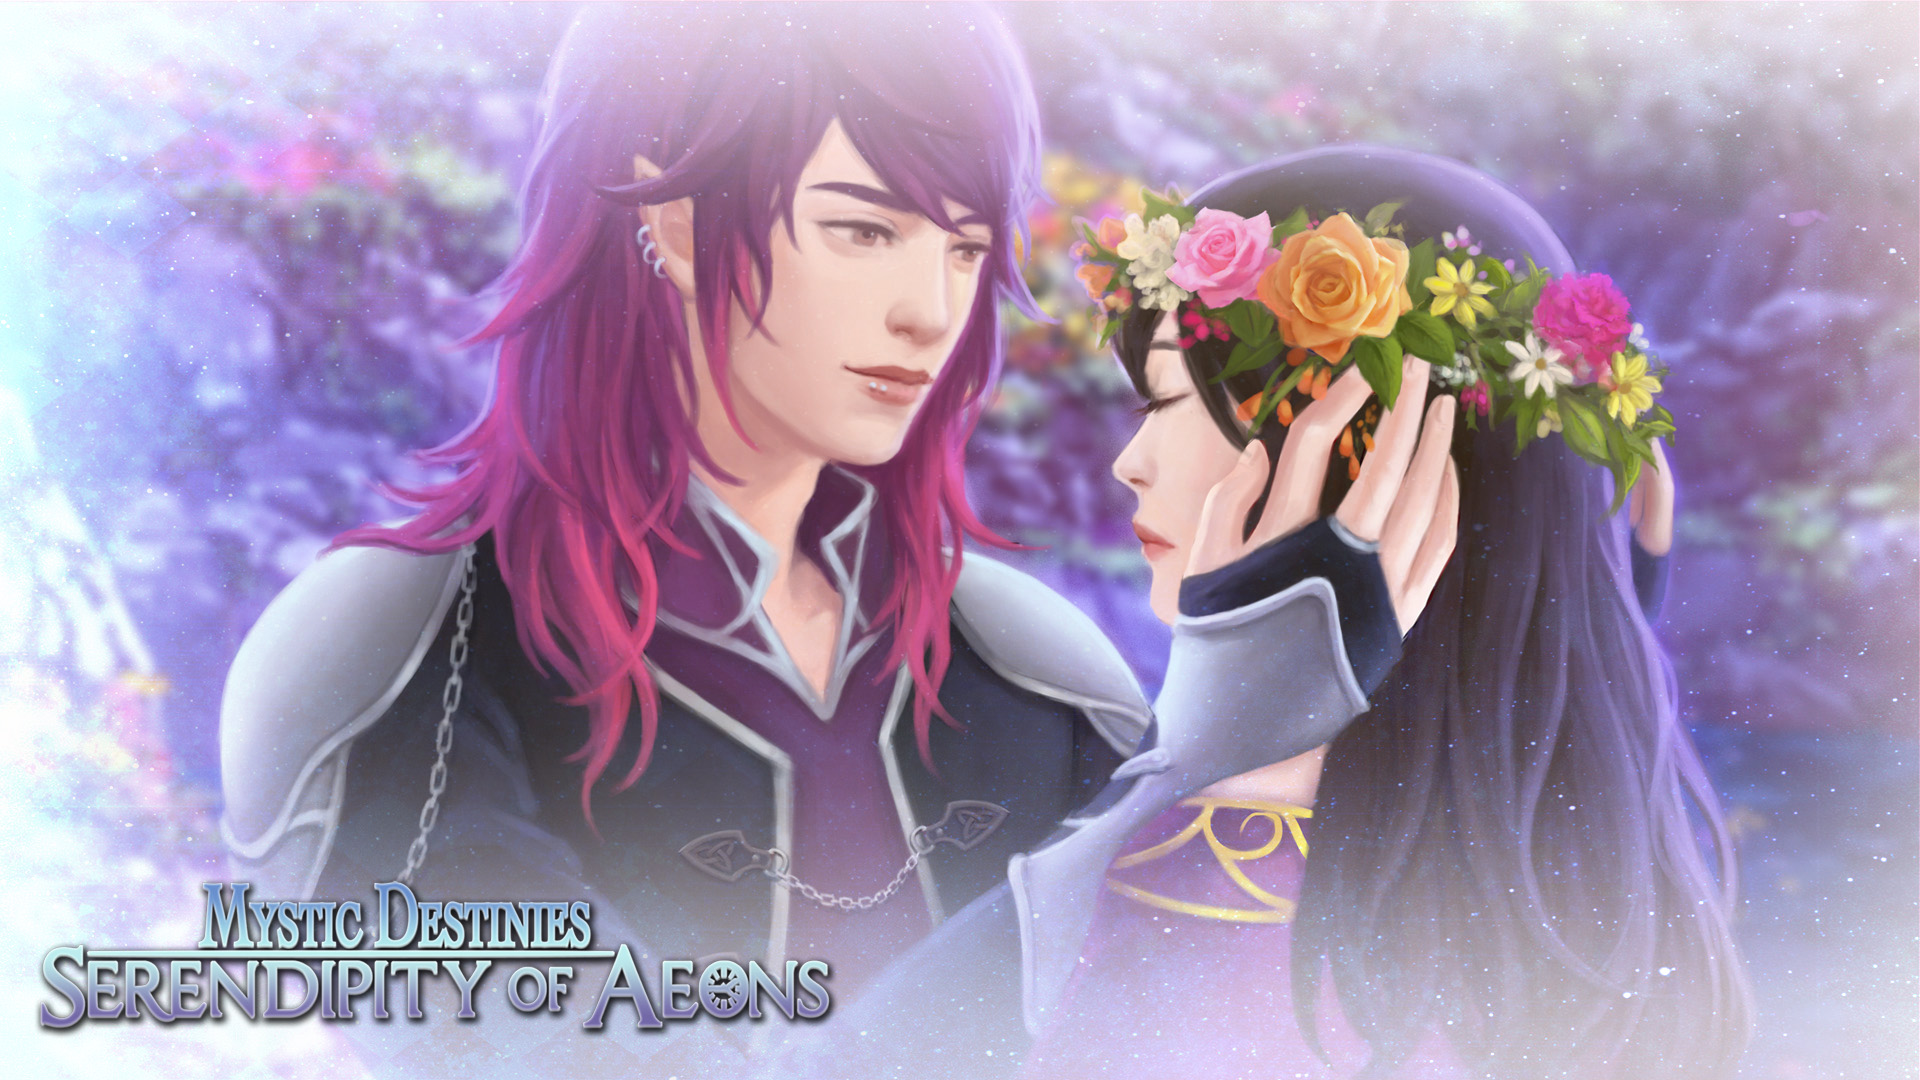 Mystic Destinies: Serendipity of Aeons - Shinji